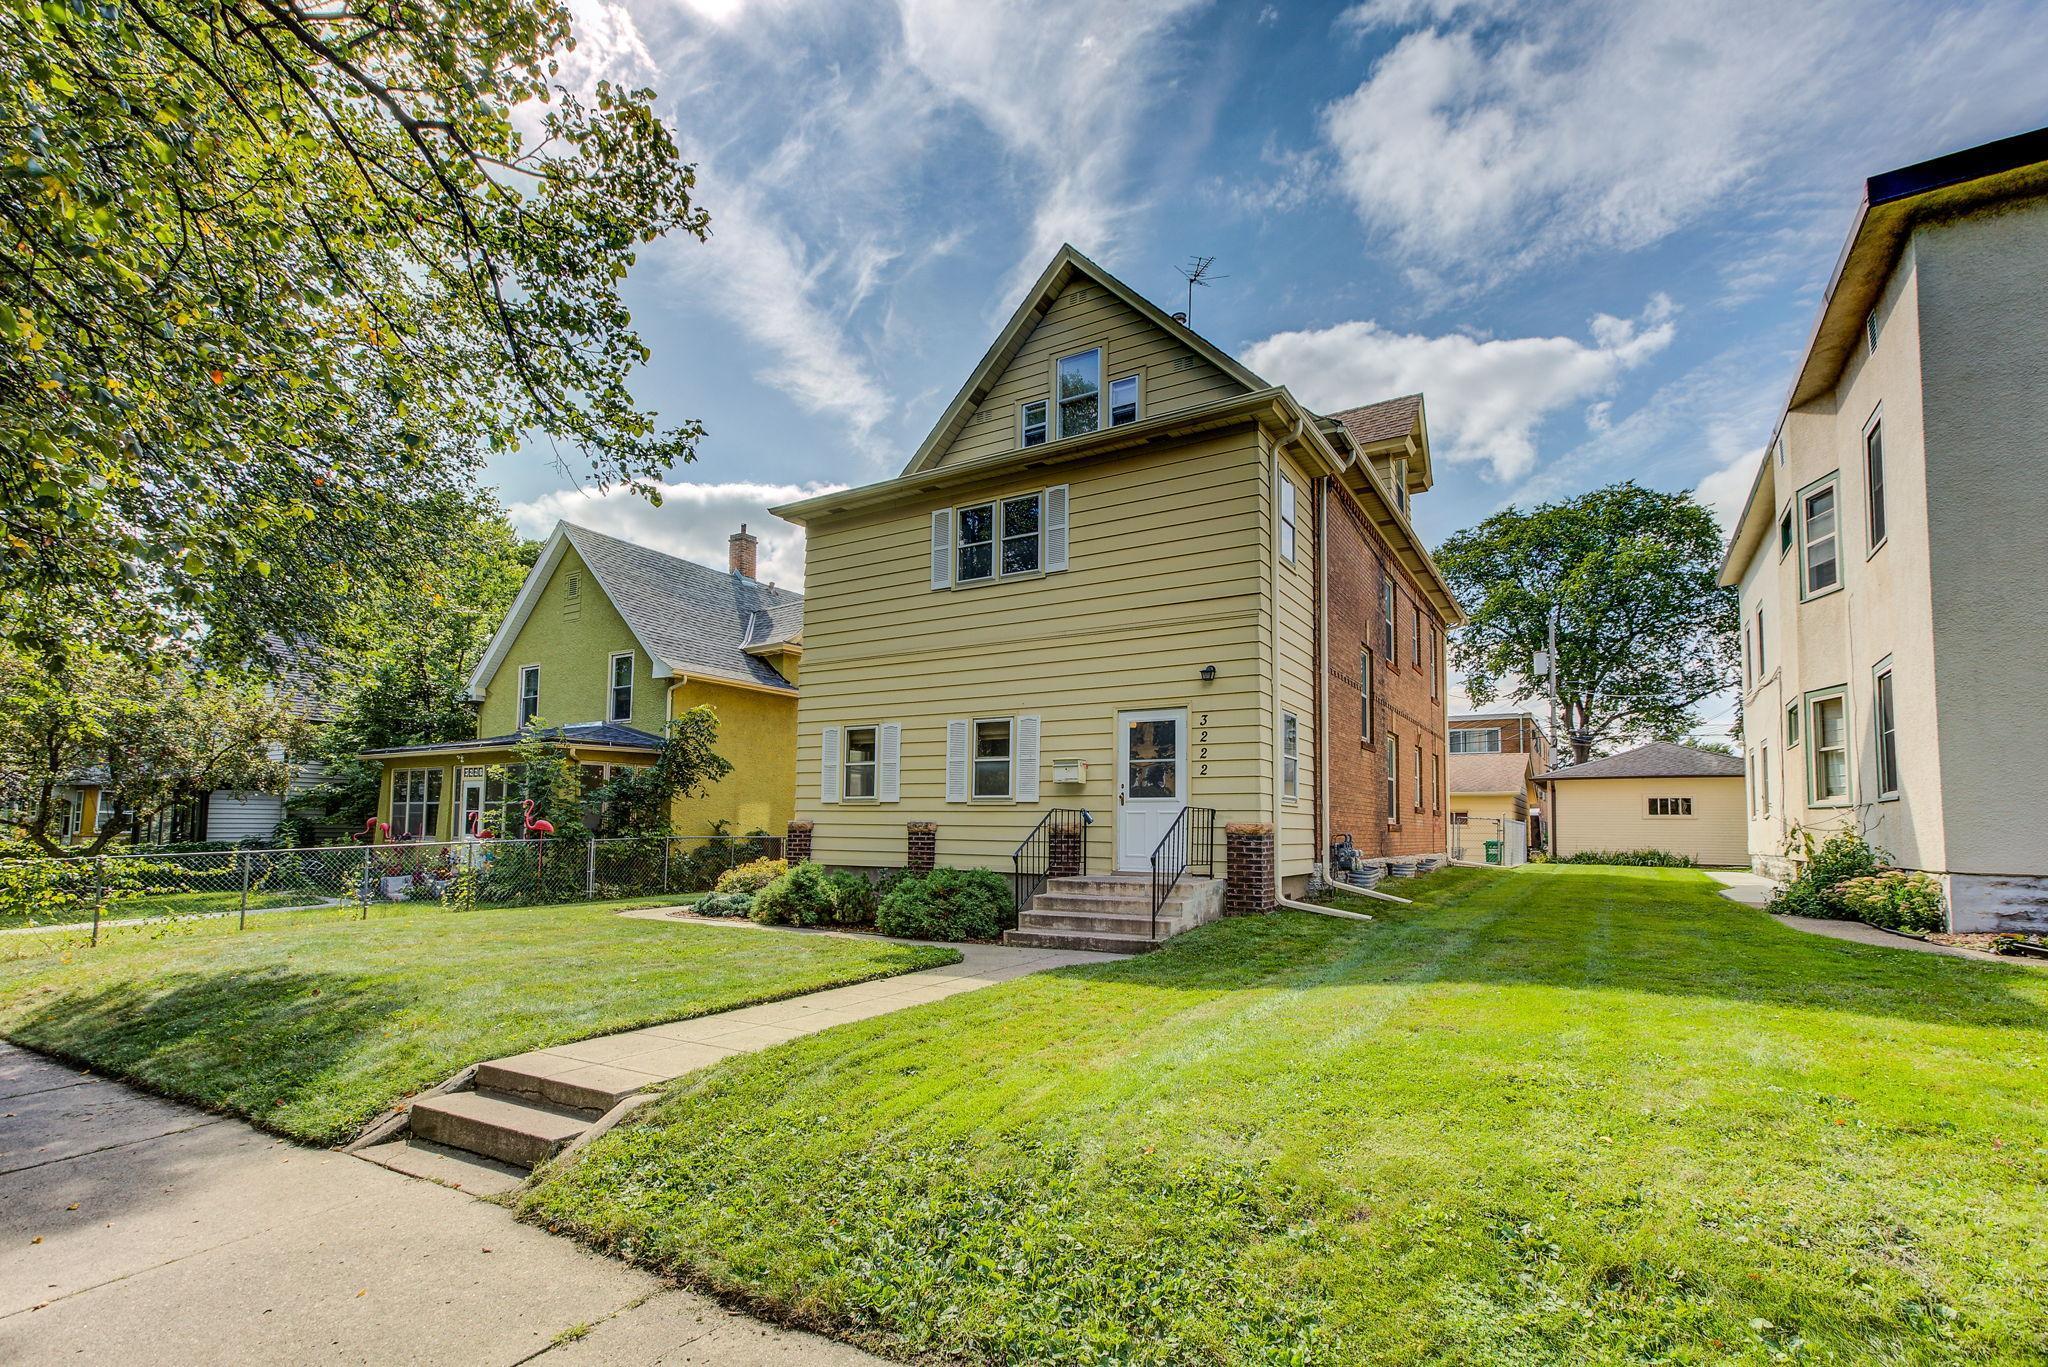 3222 15th Avenue S Property Photo - Minneapolis, MN real estate listing